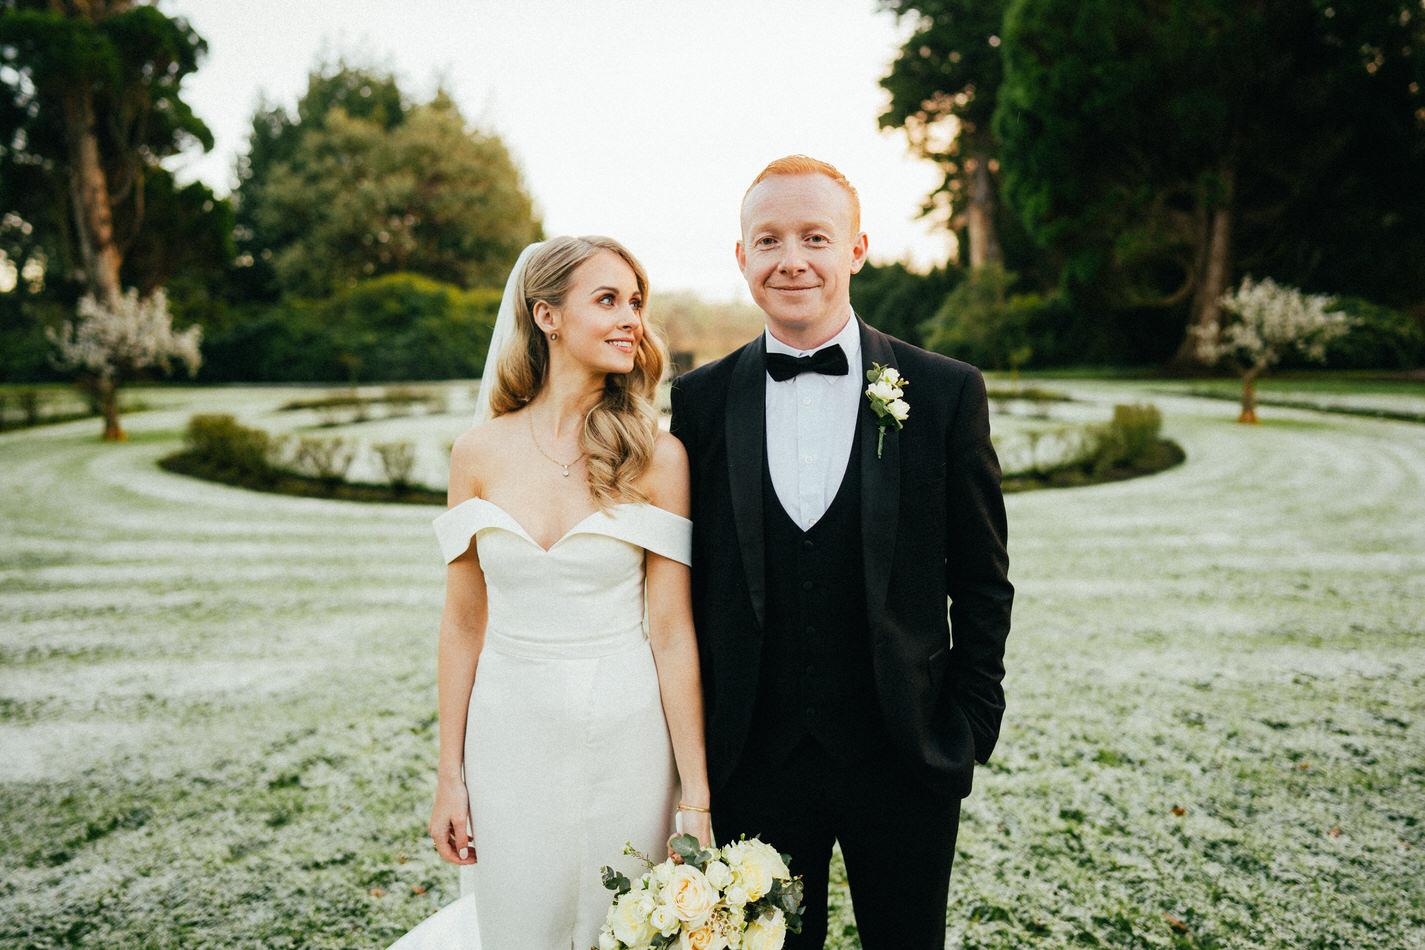 Castle-wedding-ireland-photos- 0203 145